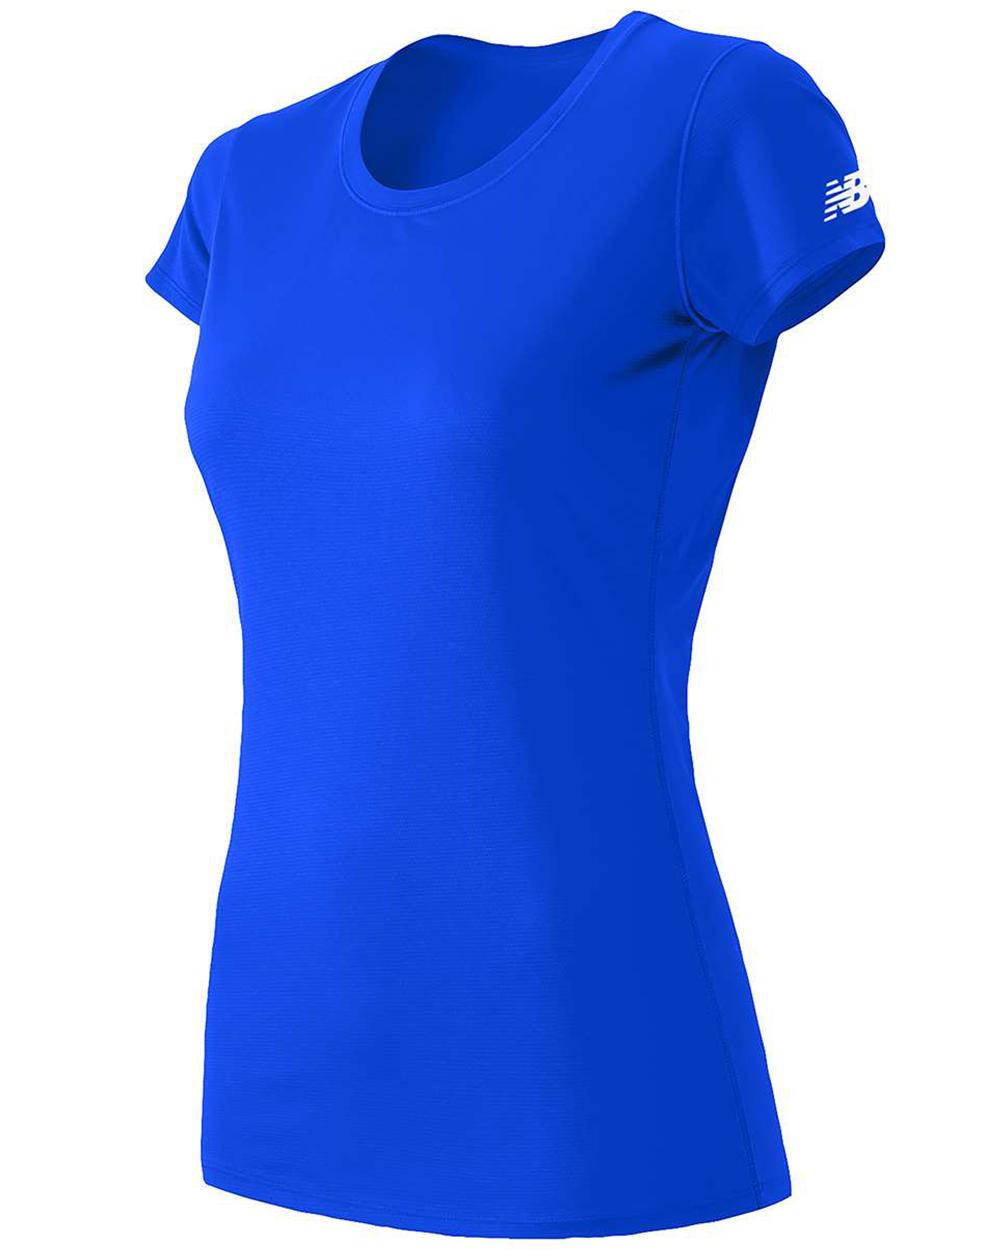 Ladies' Short Sleeve Shirt